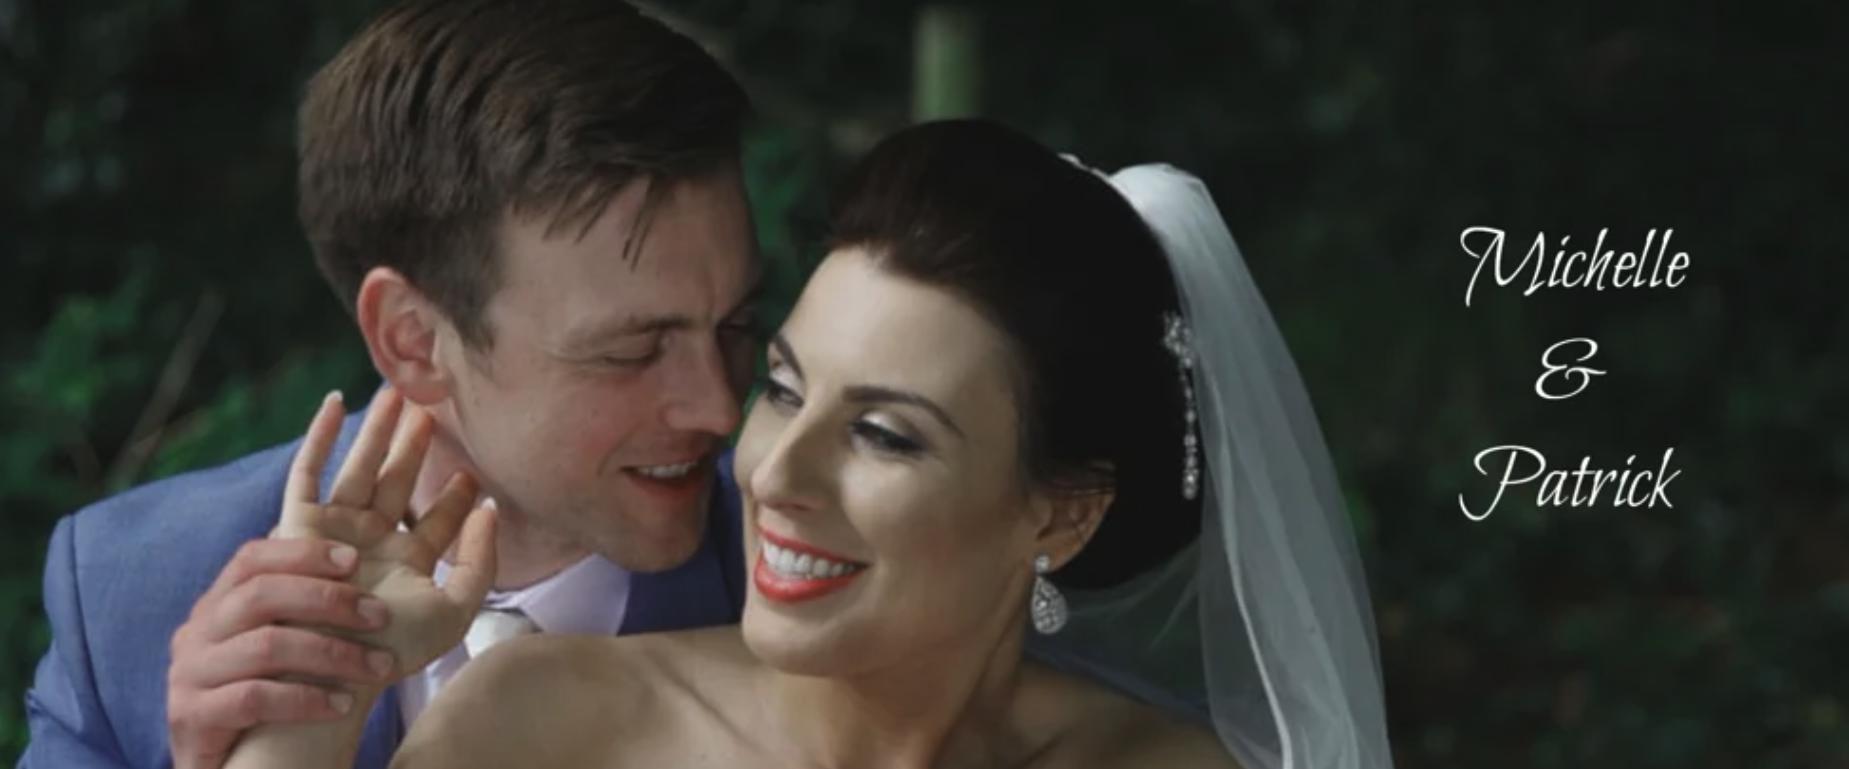 Wedding Video Mayo-Michelle & Patrick